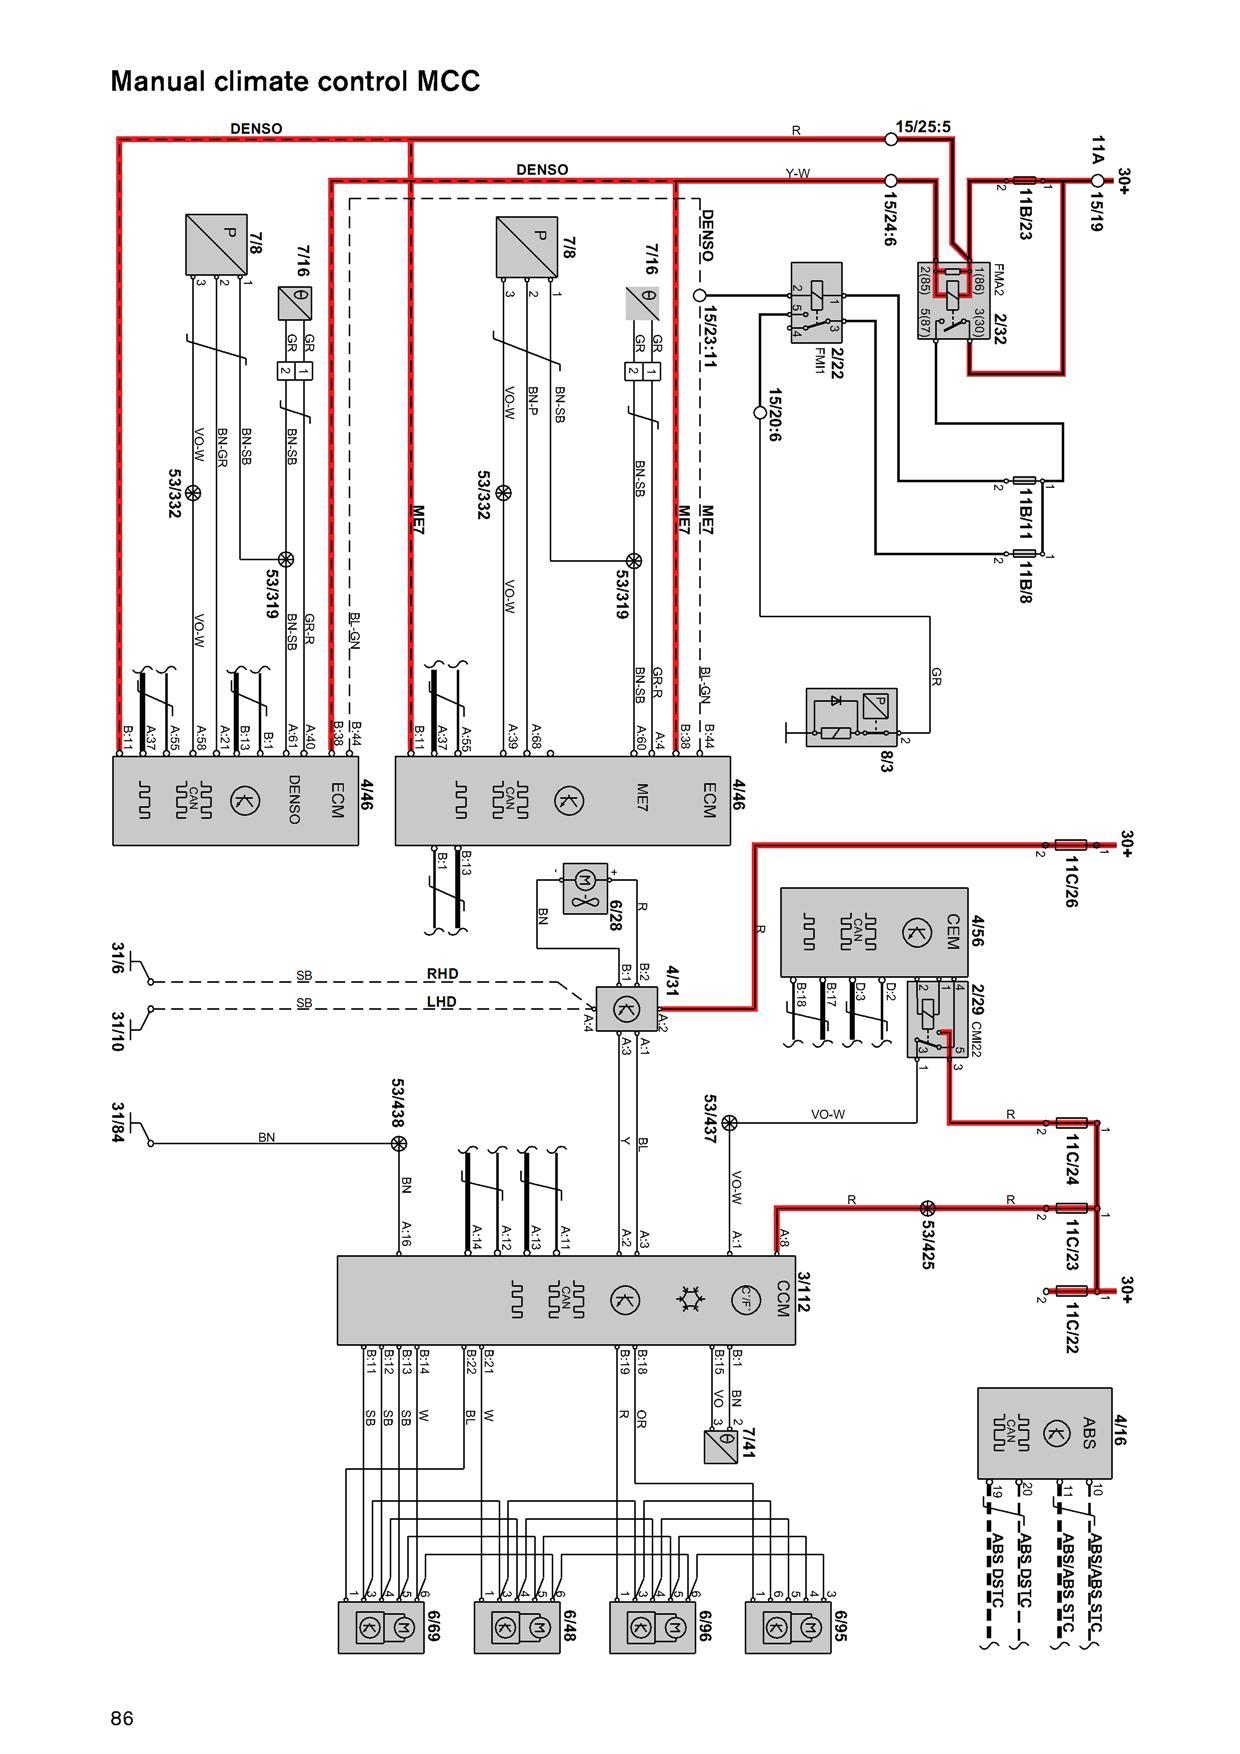 04 Volvo Xc90 Wiring Diagram